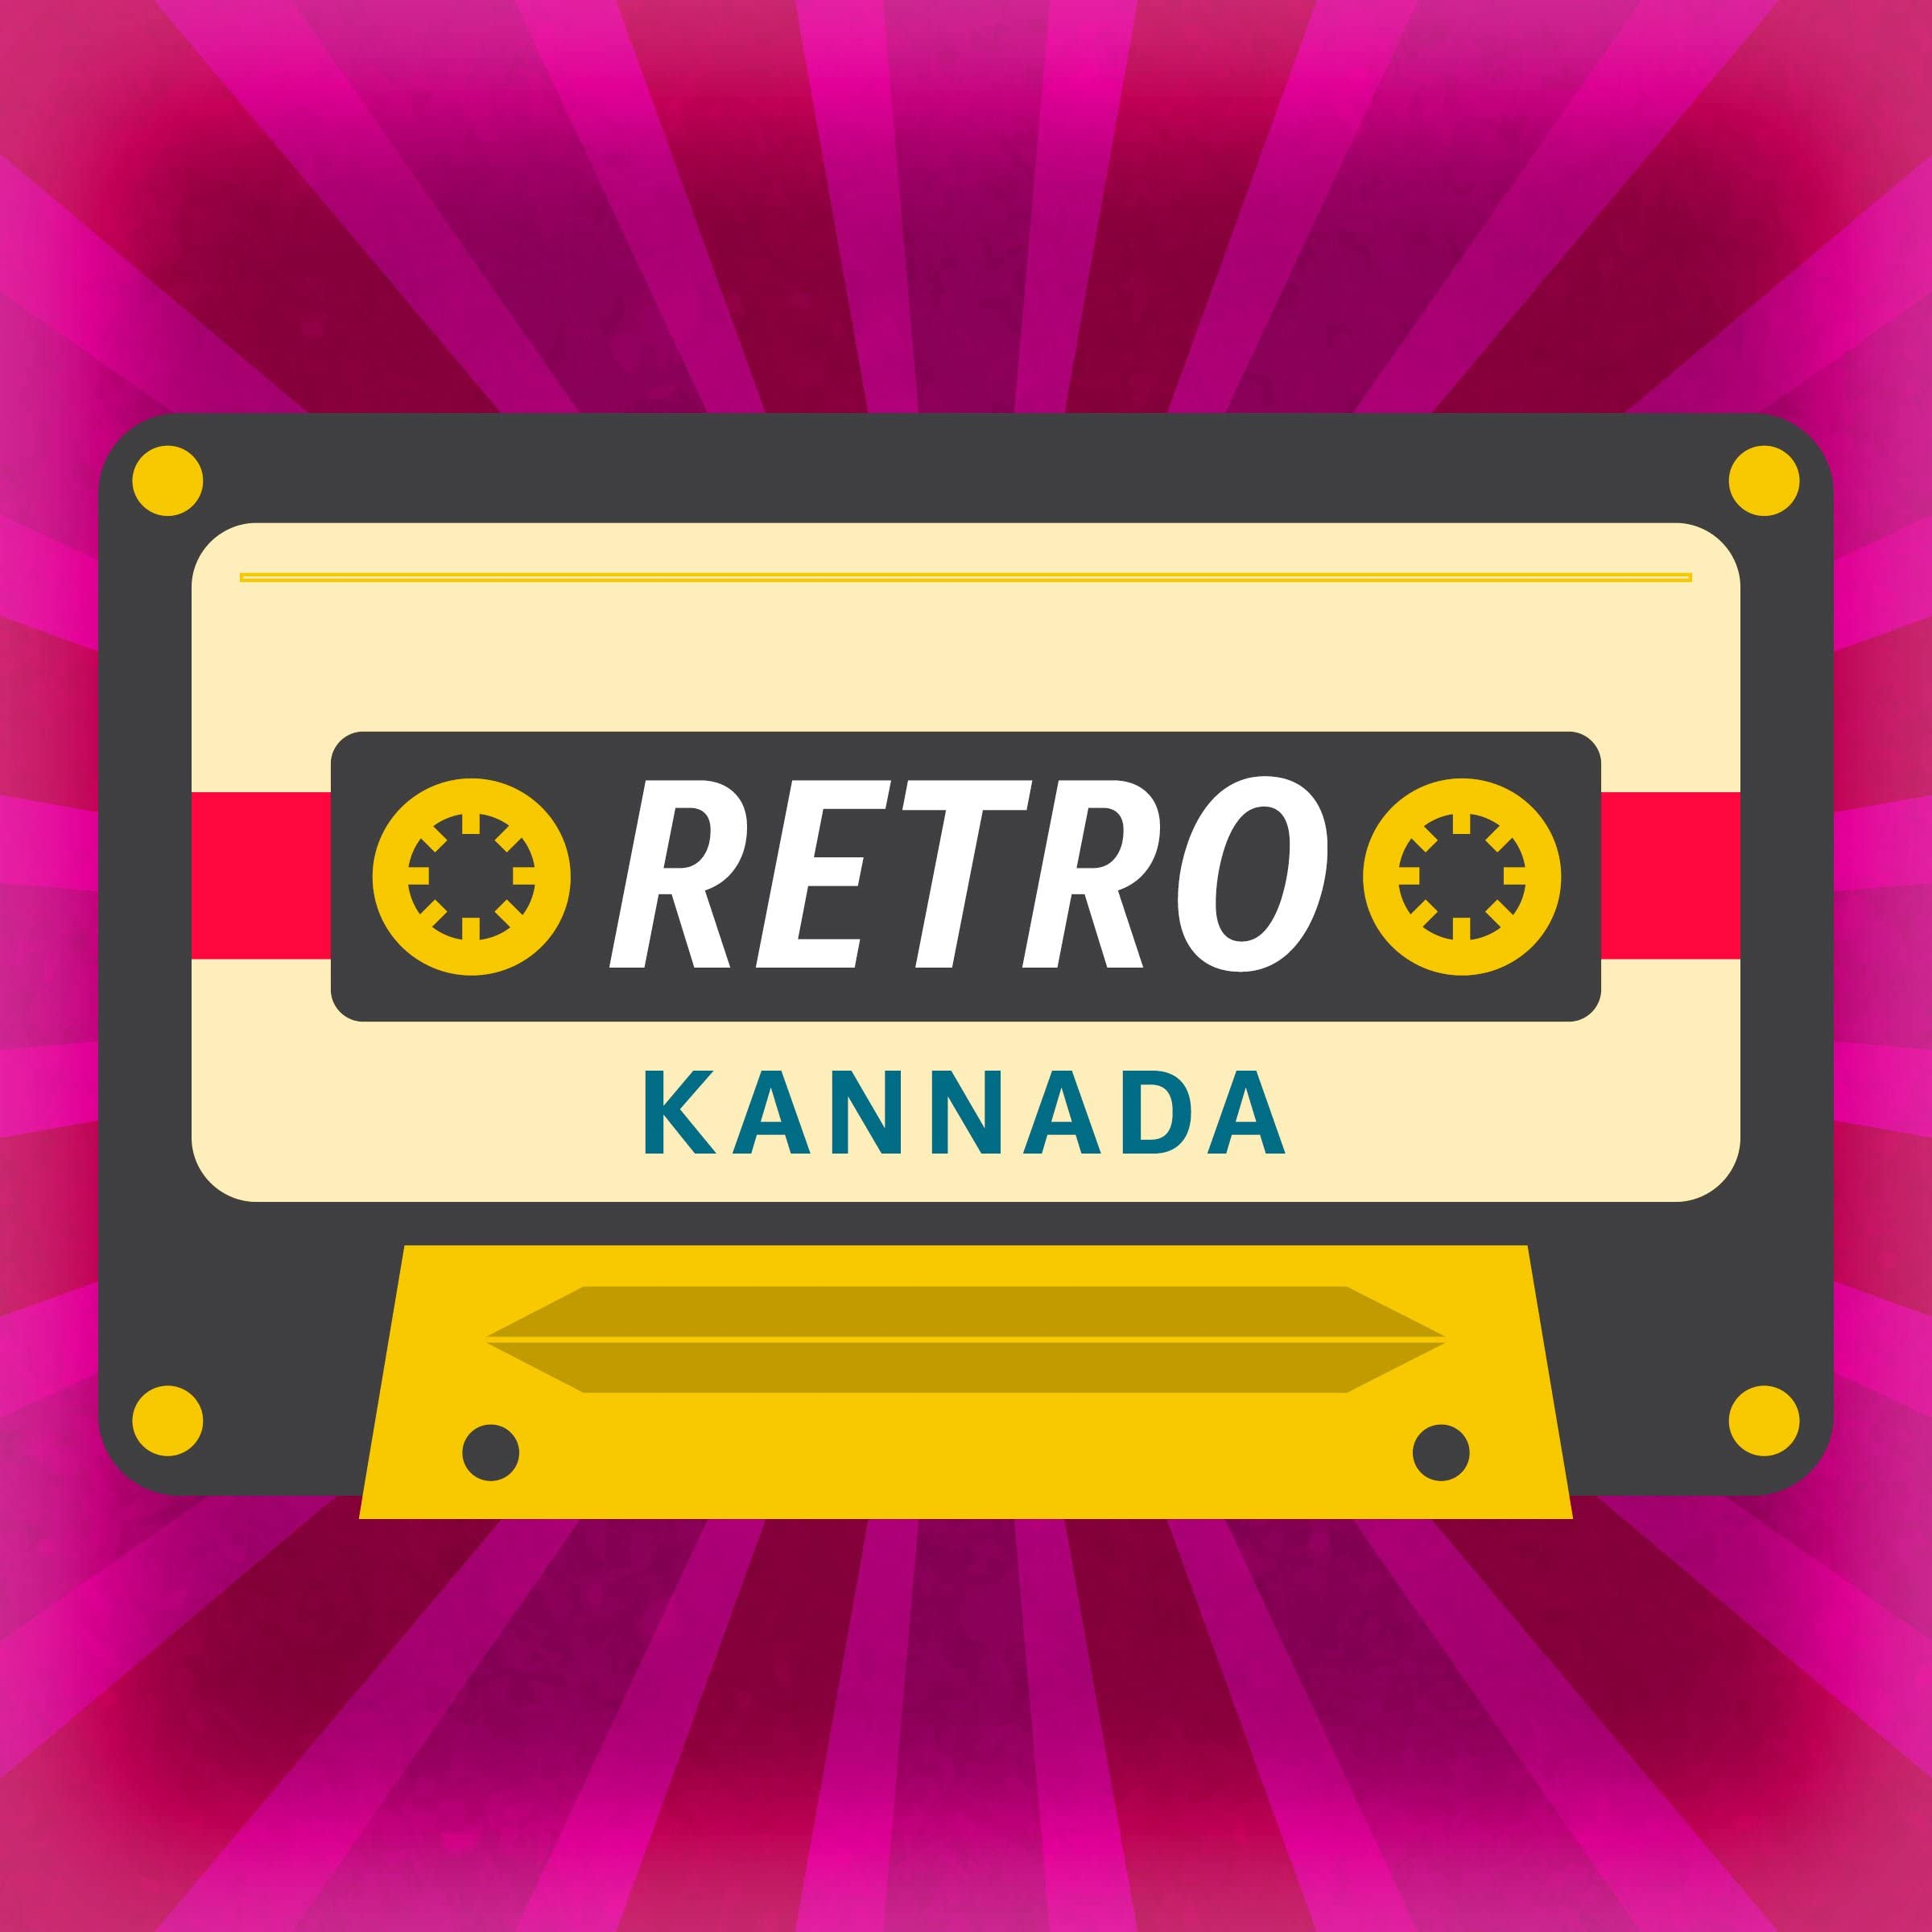 Retro Kannada